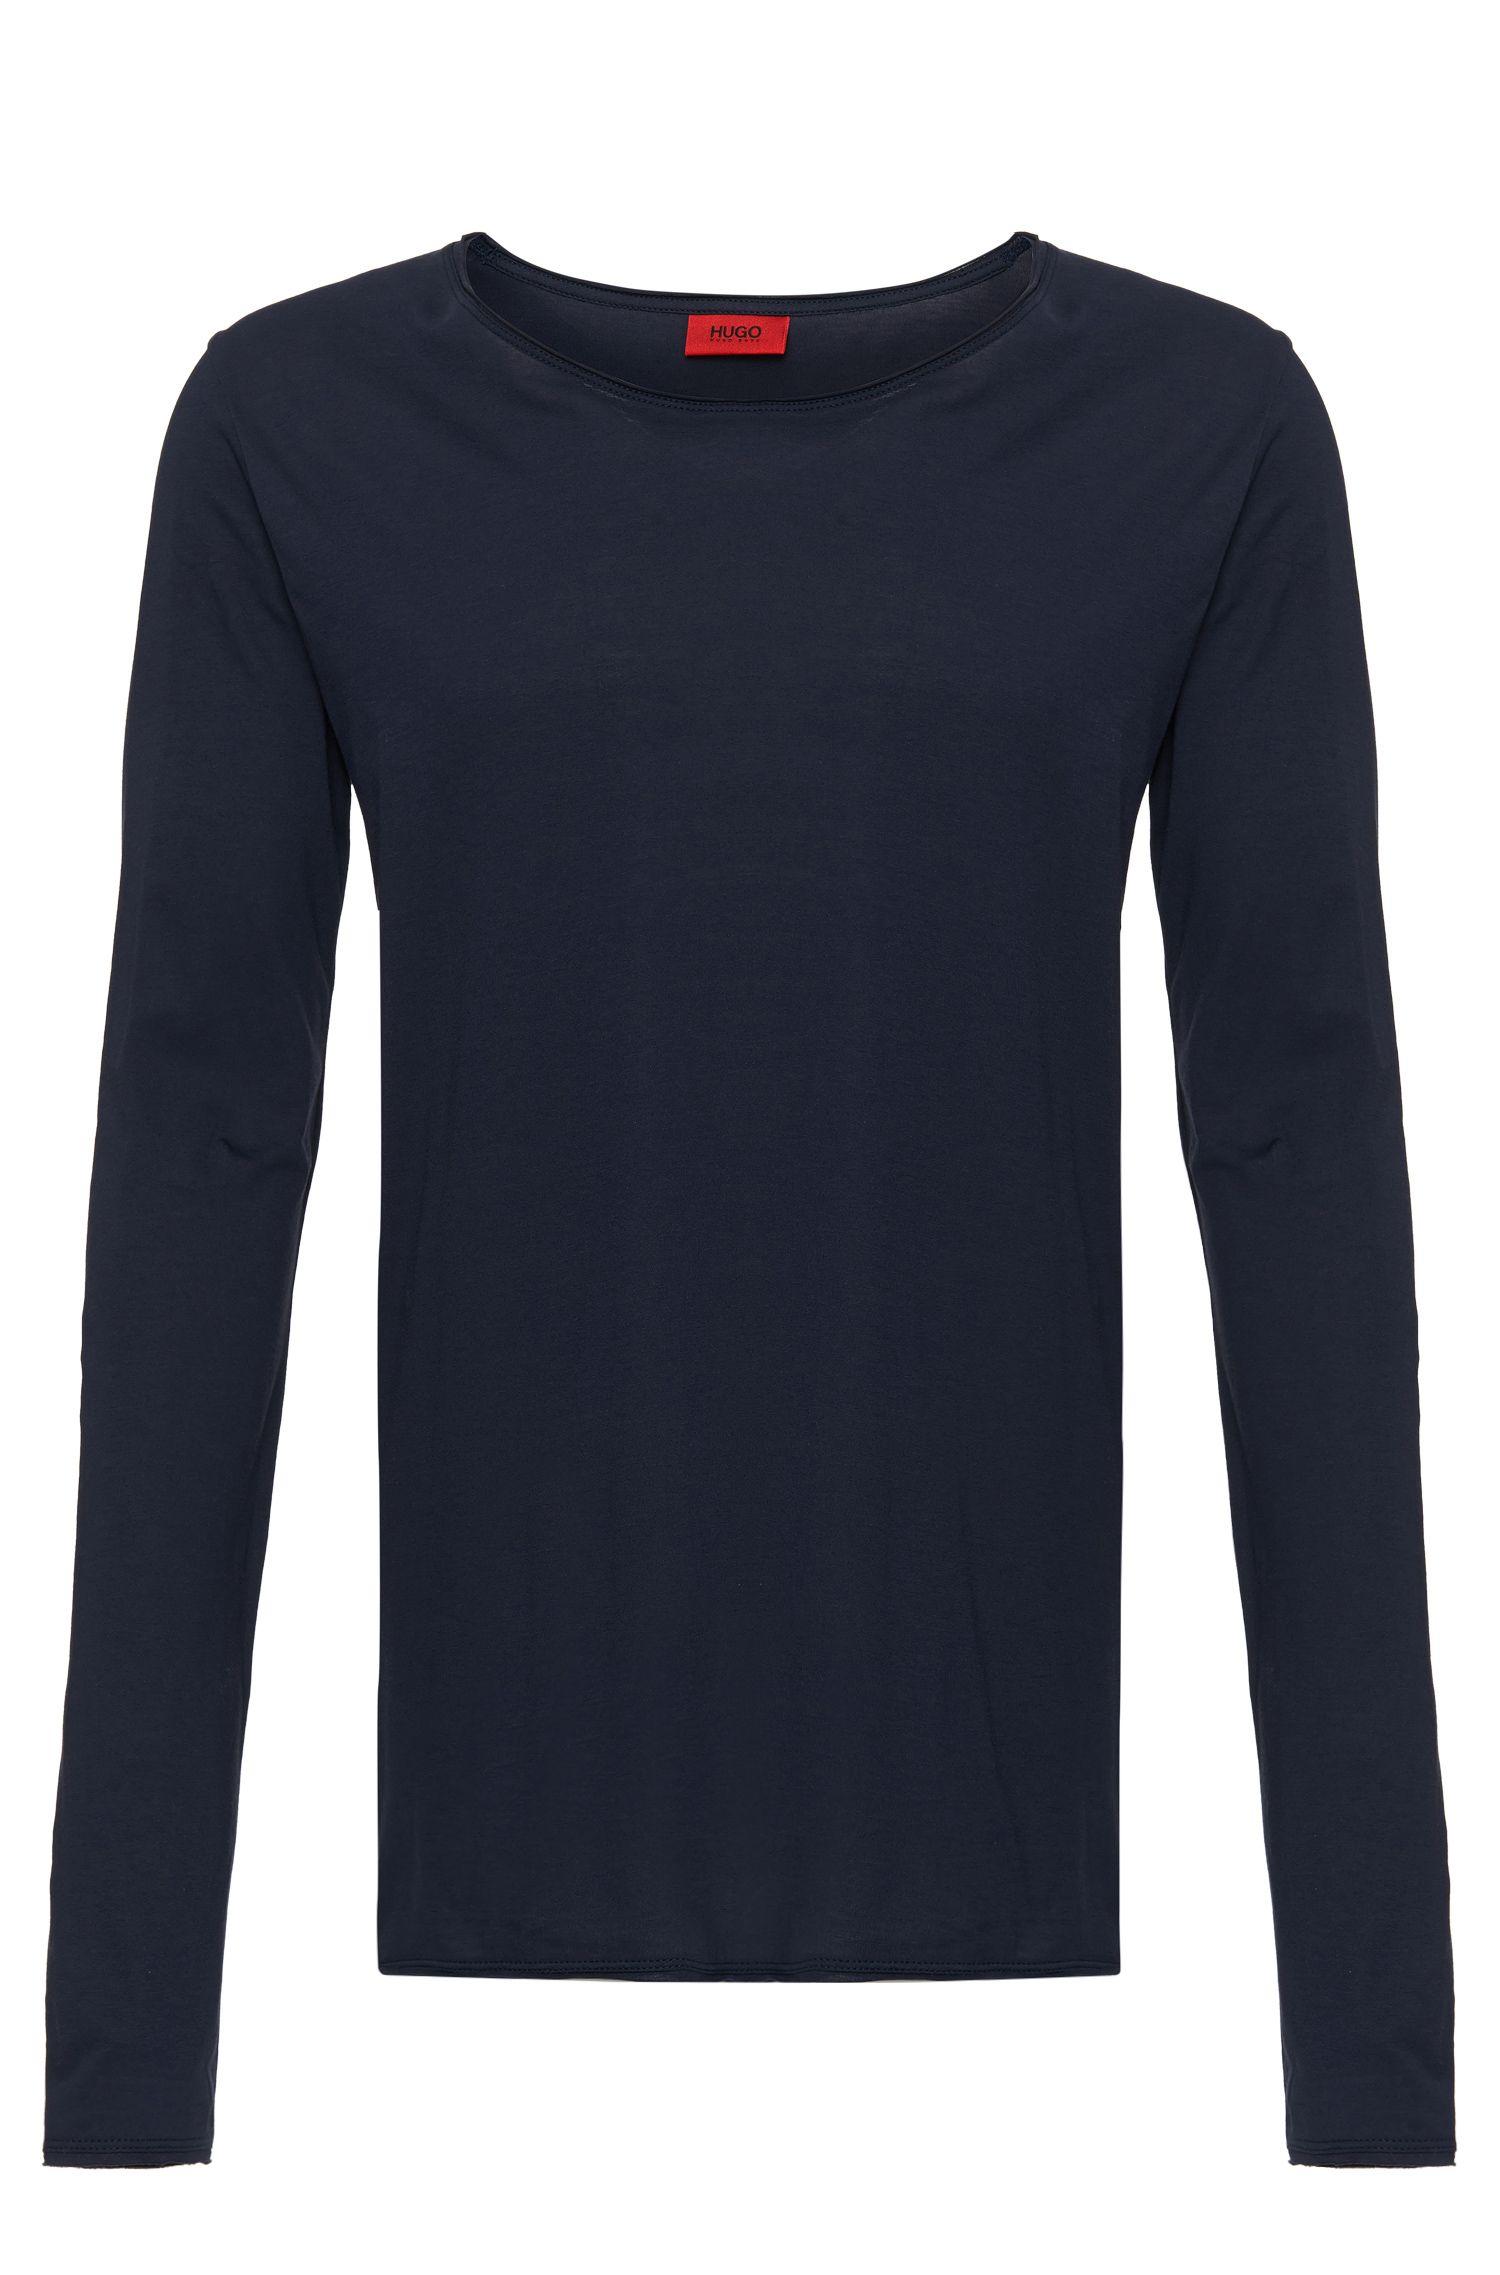 'Doops'   Supima Cotton Long Sleeve T-Shirt